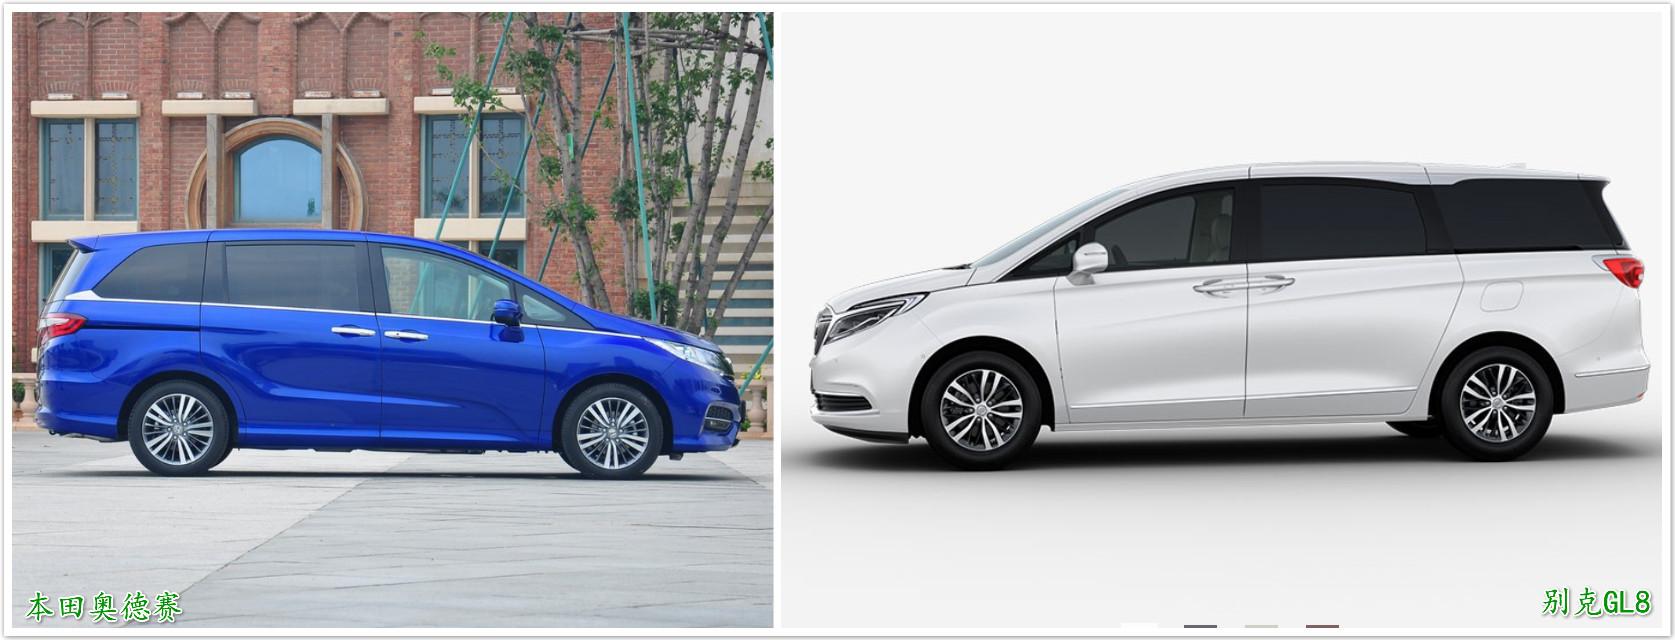 MPV车型:本田奥德赛和别克GL8哪一款更适合家用_山西快乐十分